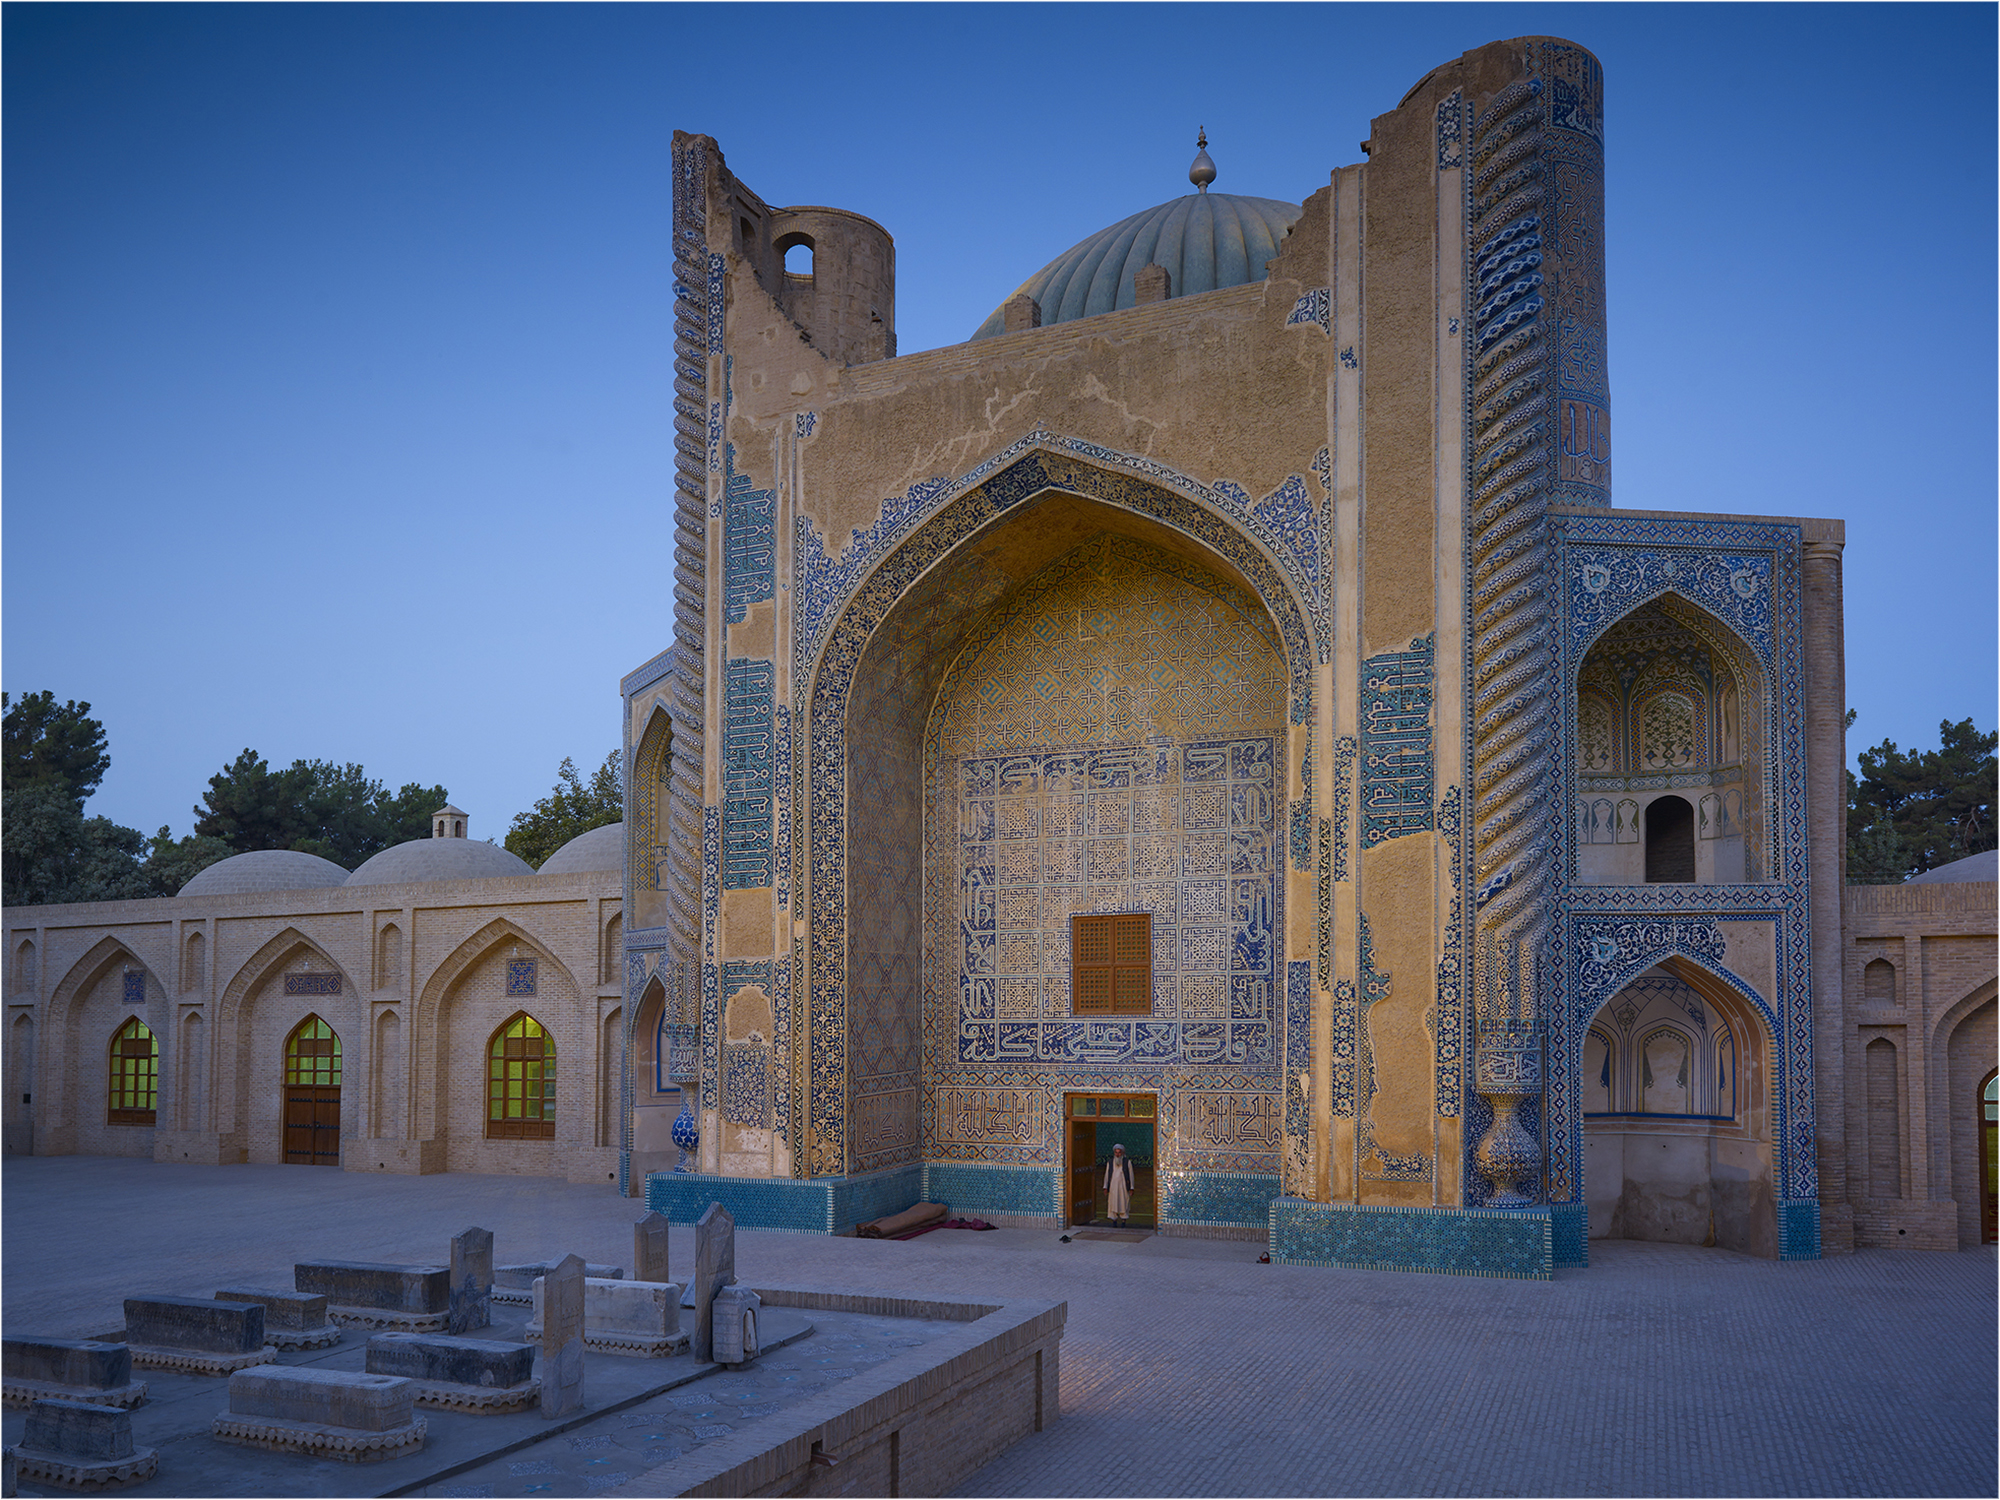 Khwaja Parsa Mosque